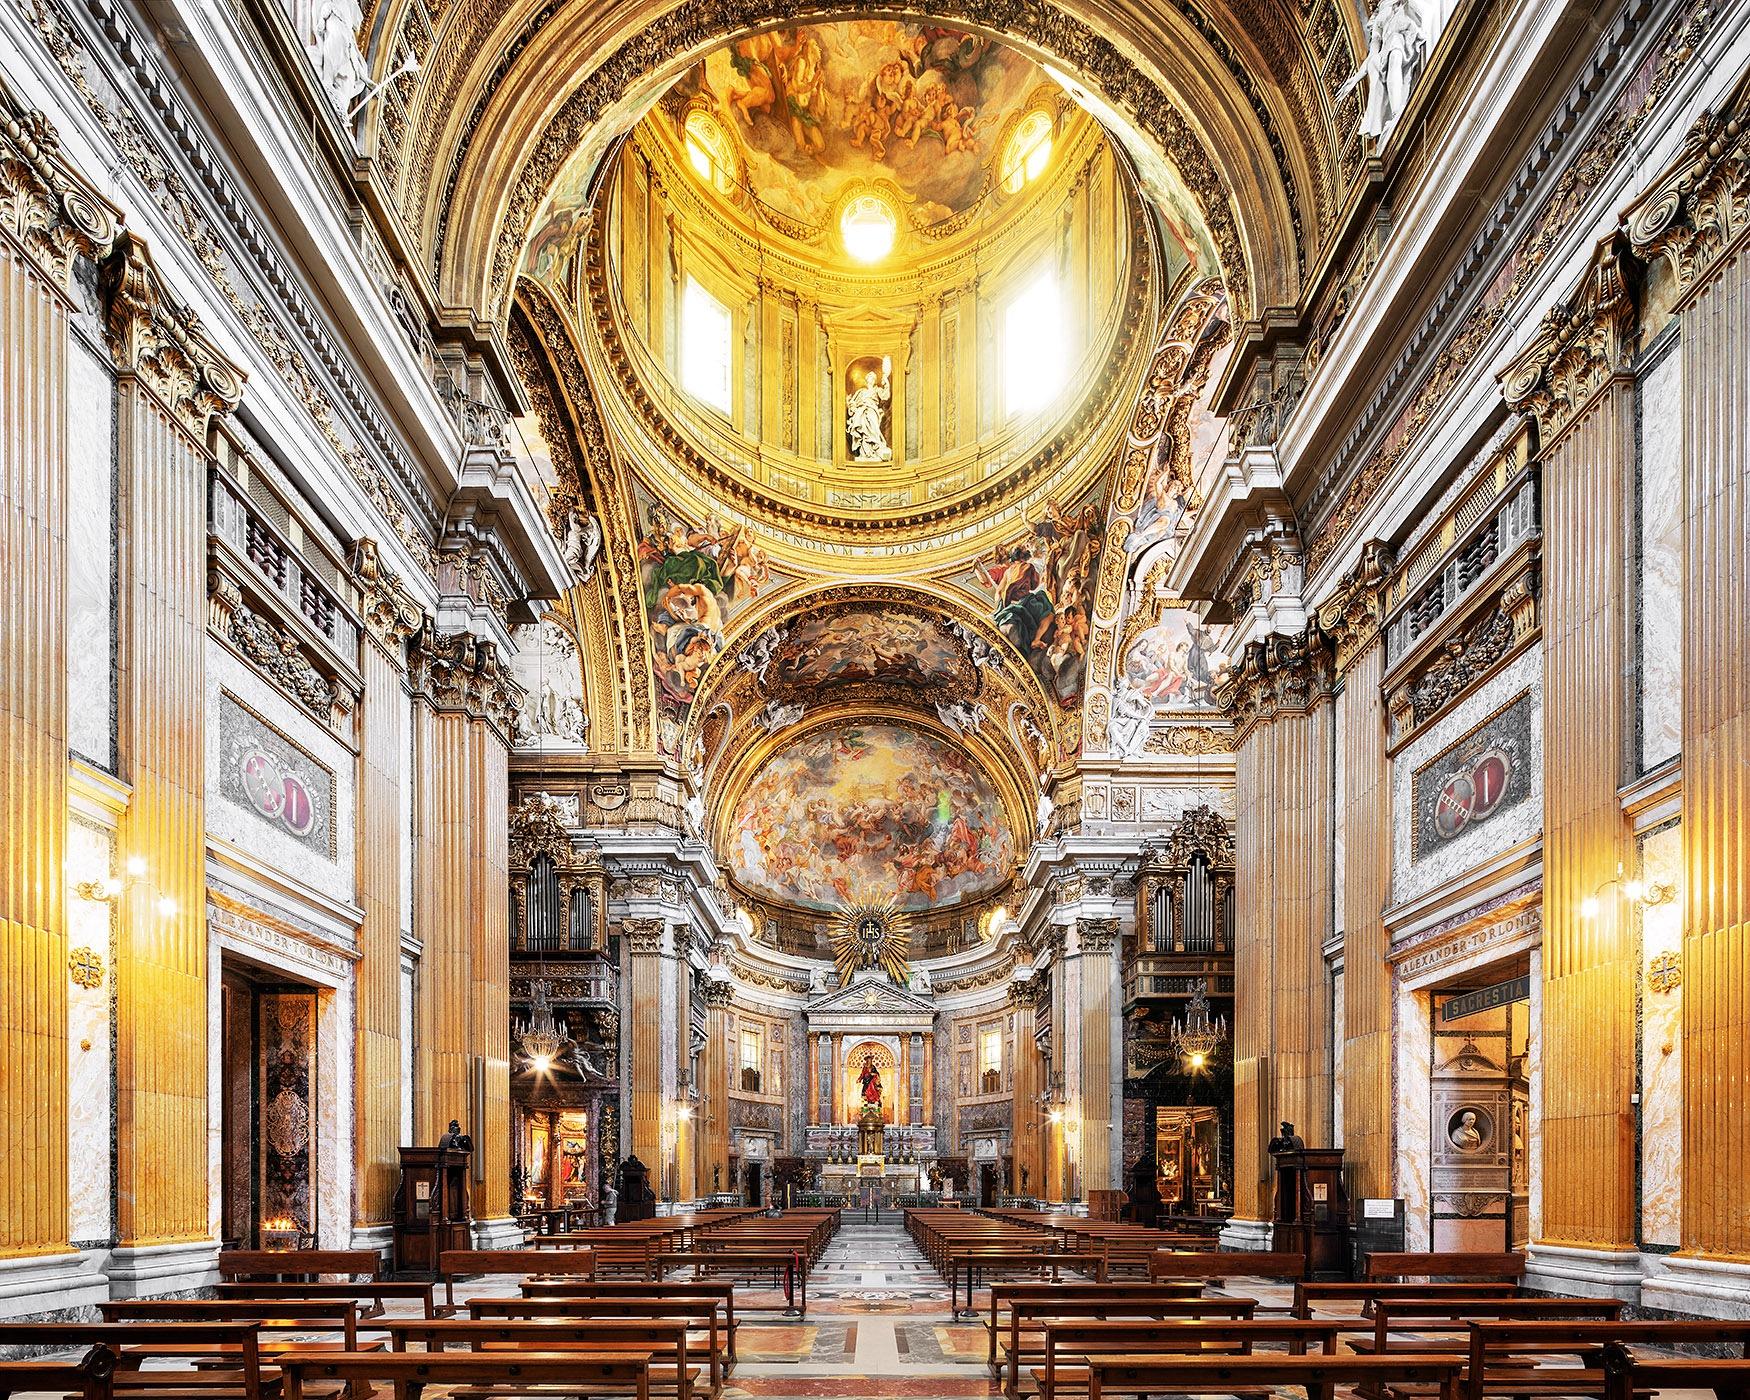 The Church of the Gesù